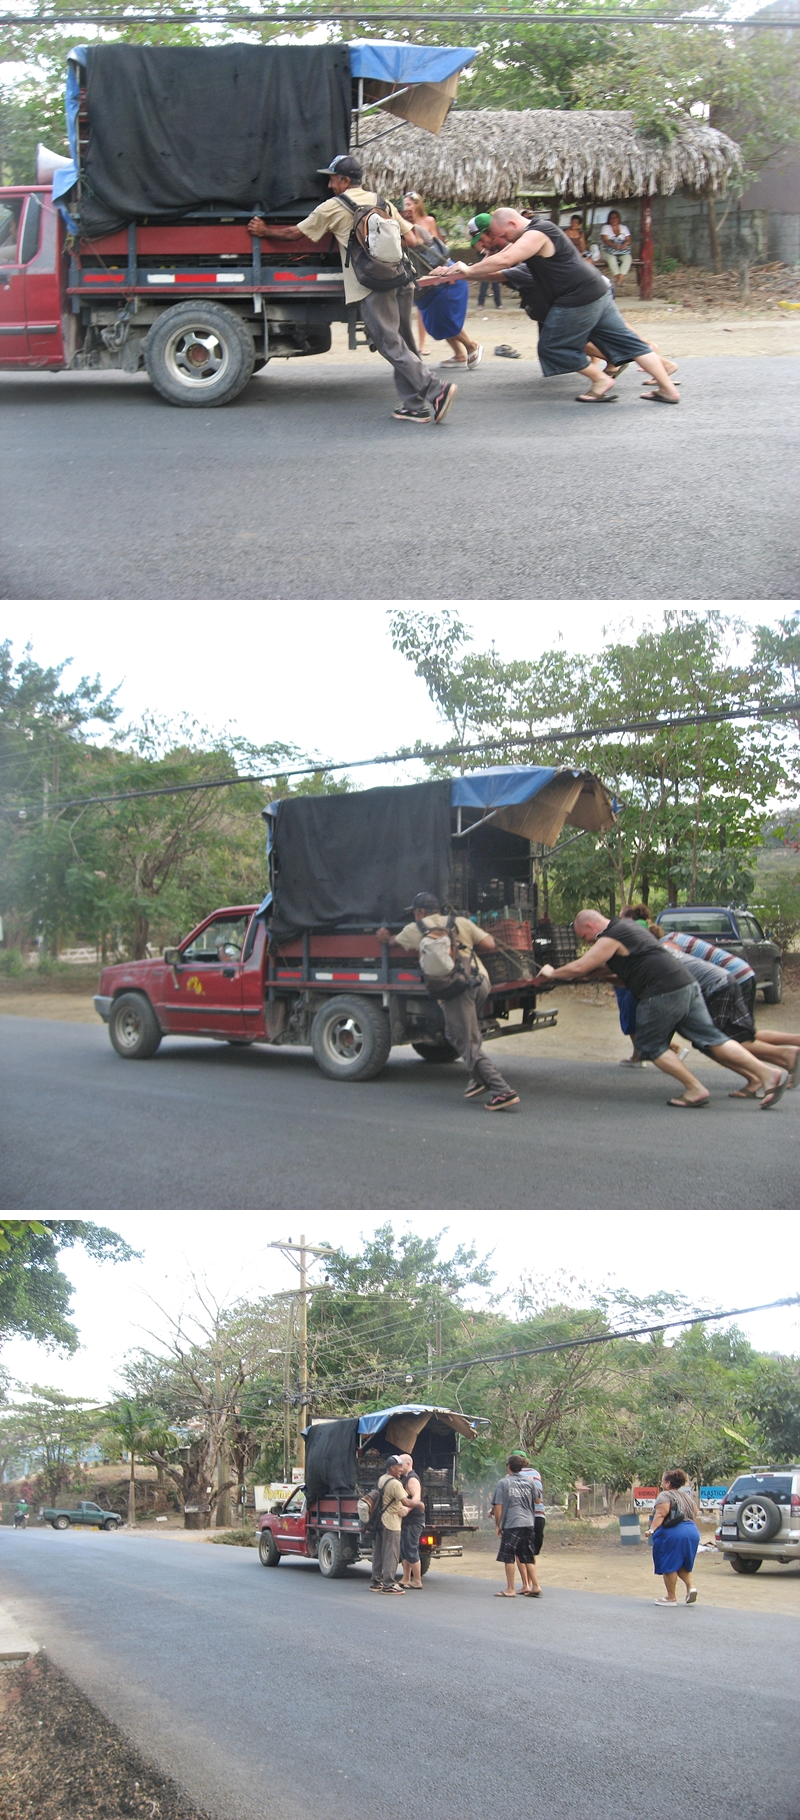 201202 Costa Rica, Tamarindo